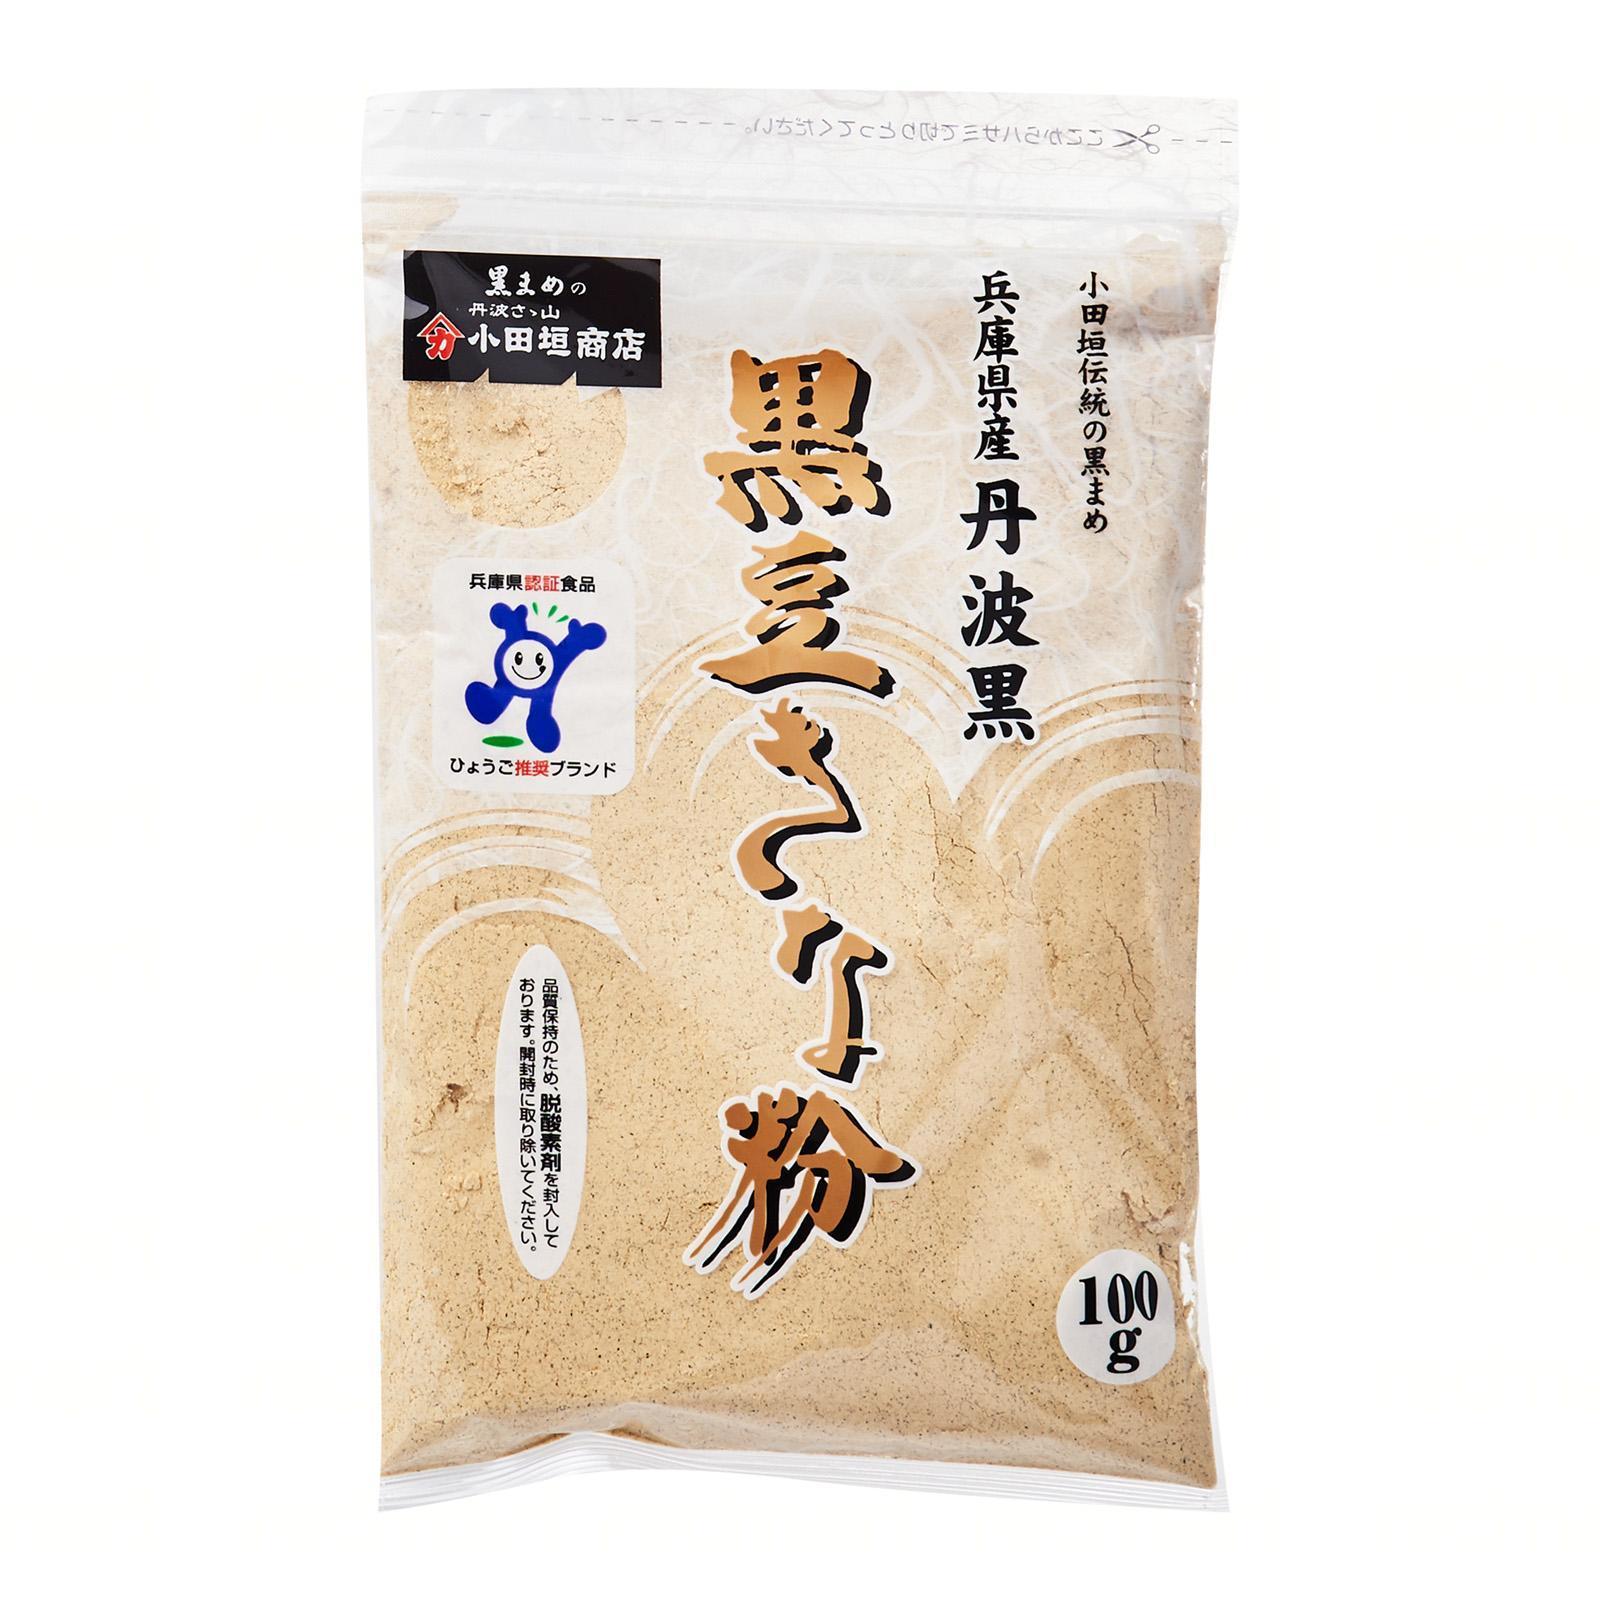 Odagaki Tambaguro Roasted Black Soybean Kinako Powder - Jetro Special